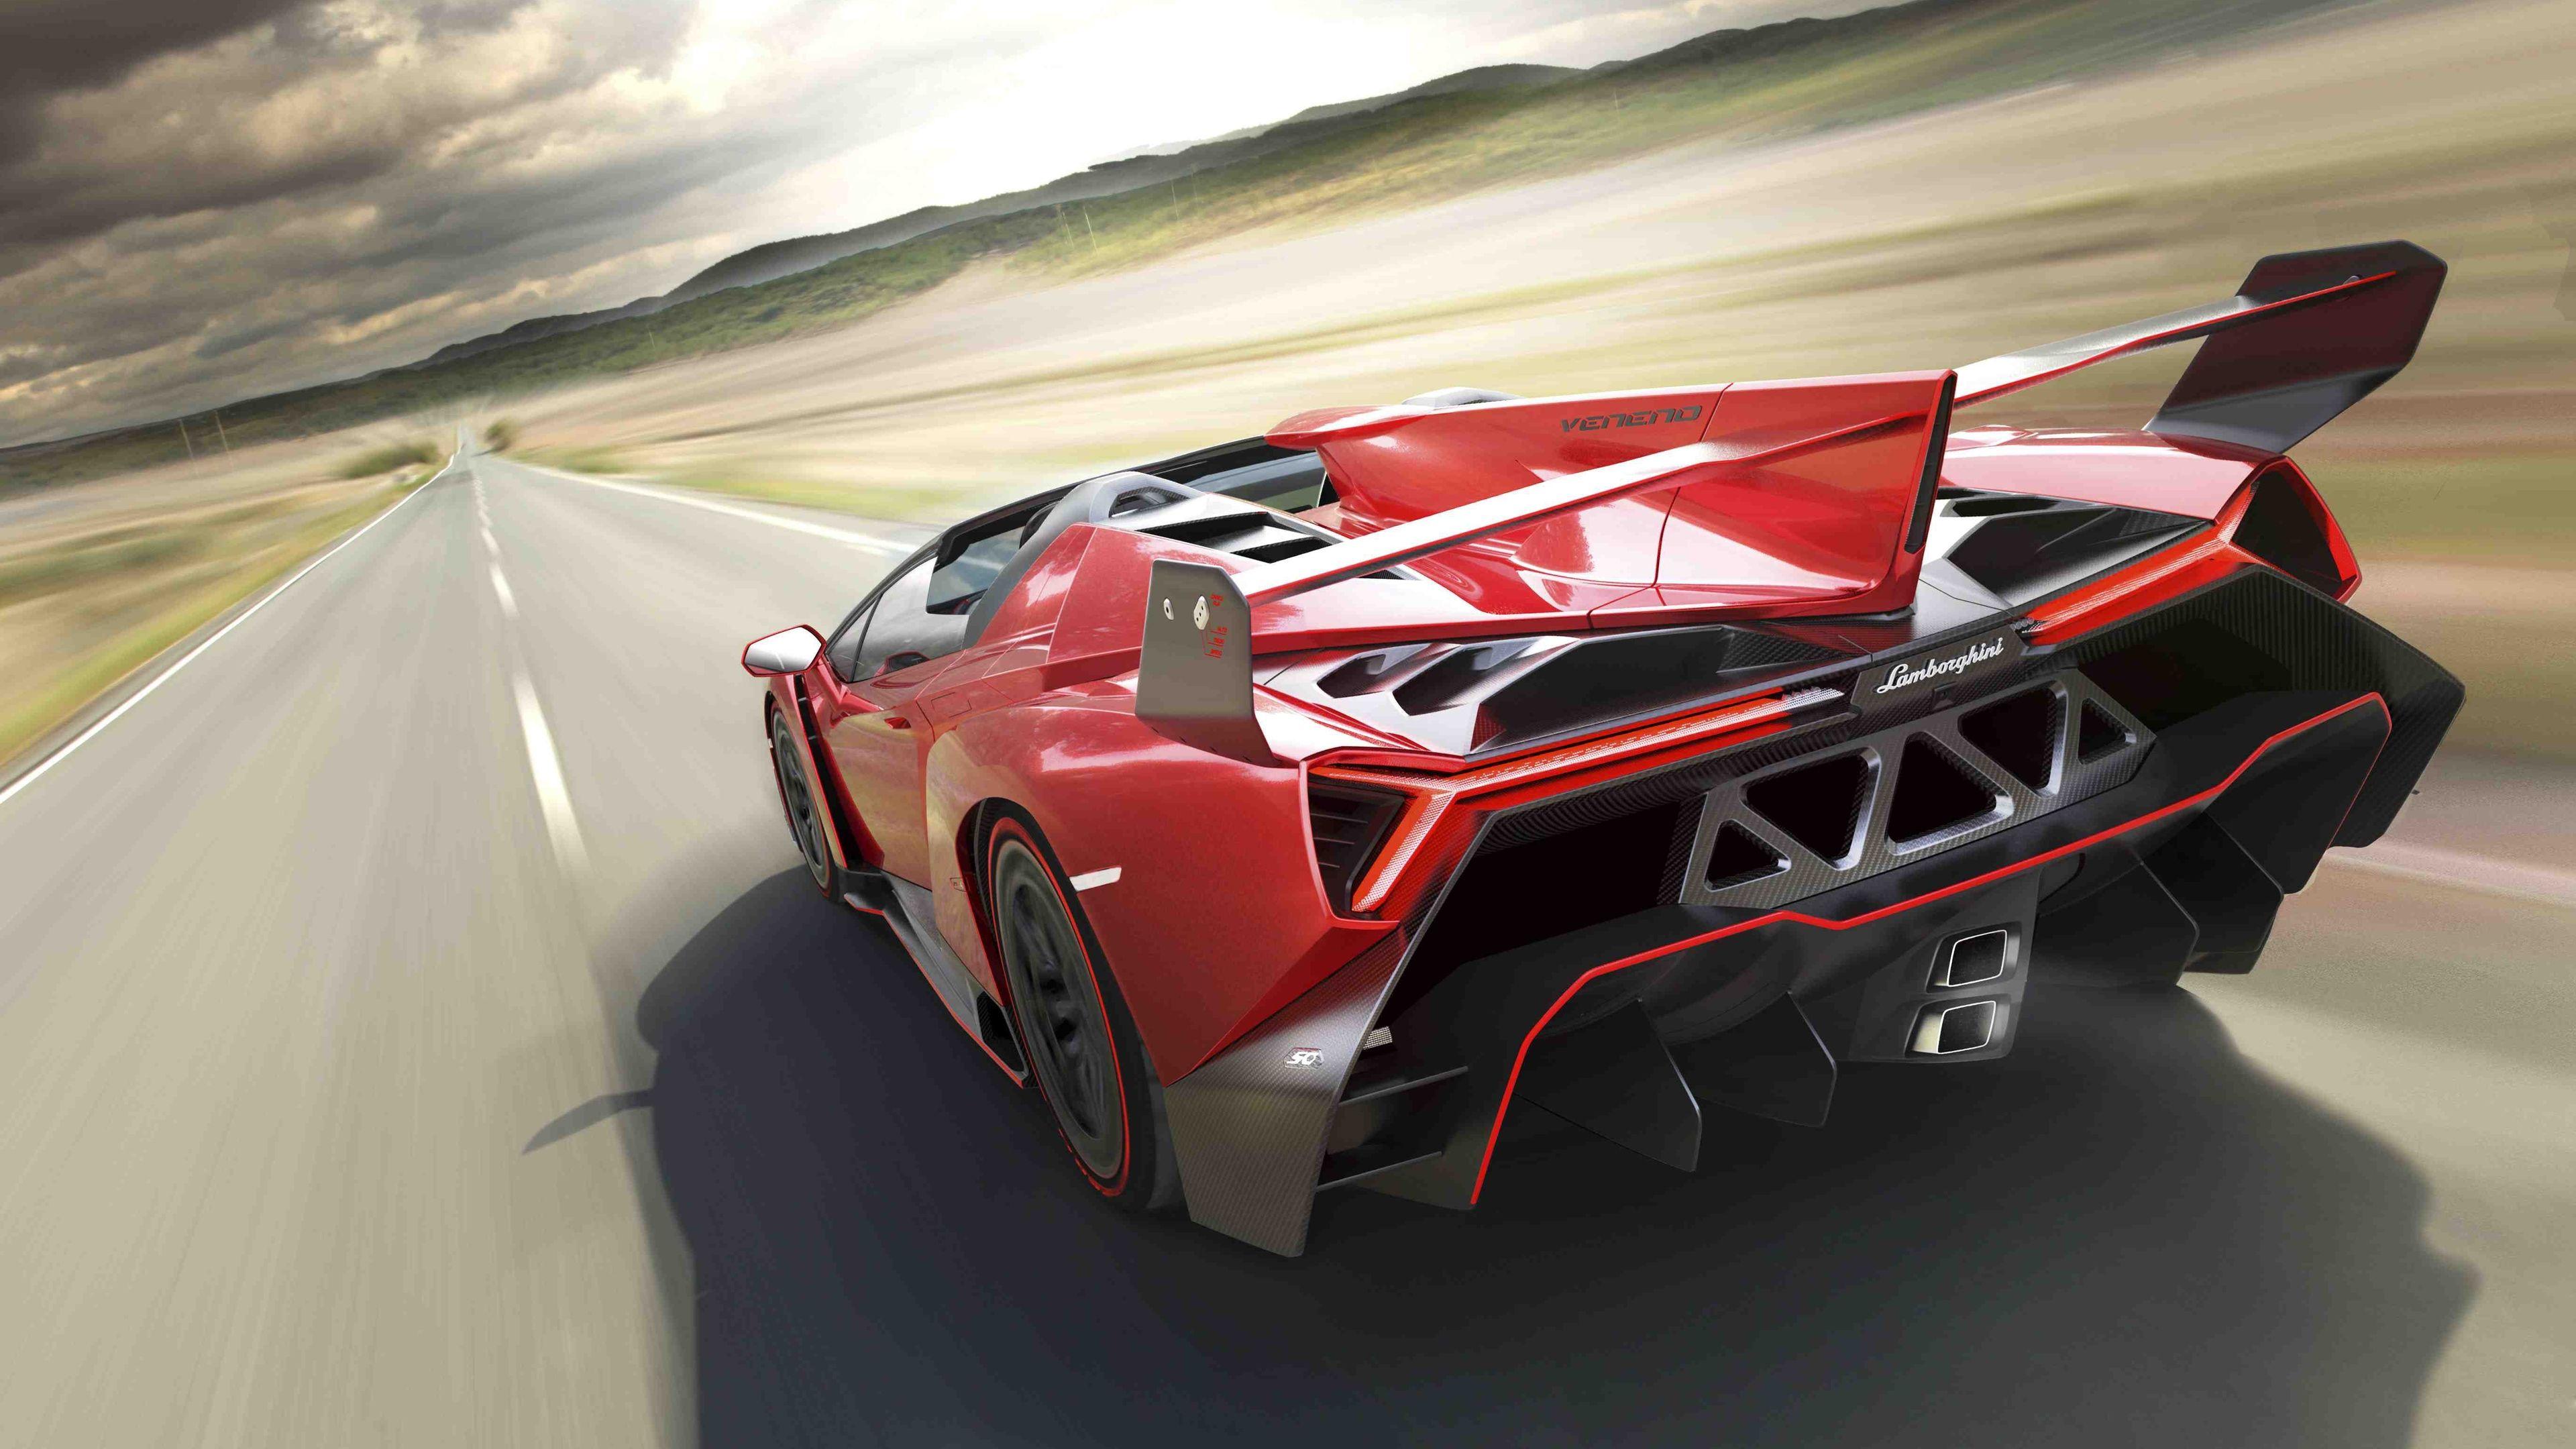 Lamborghini Veneno Roadster Rear 4k Wallpaper Lamborghini